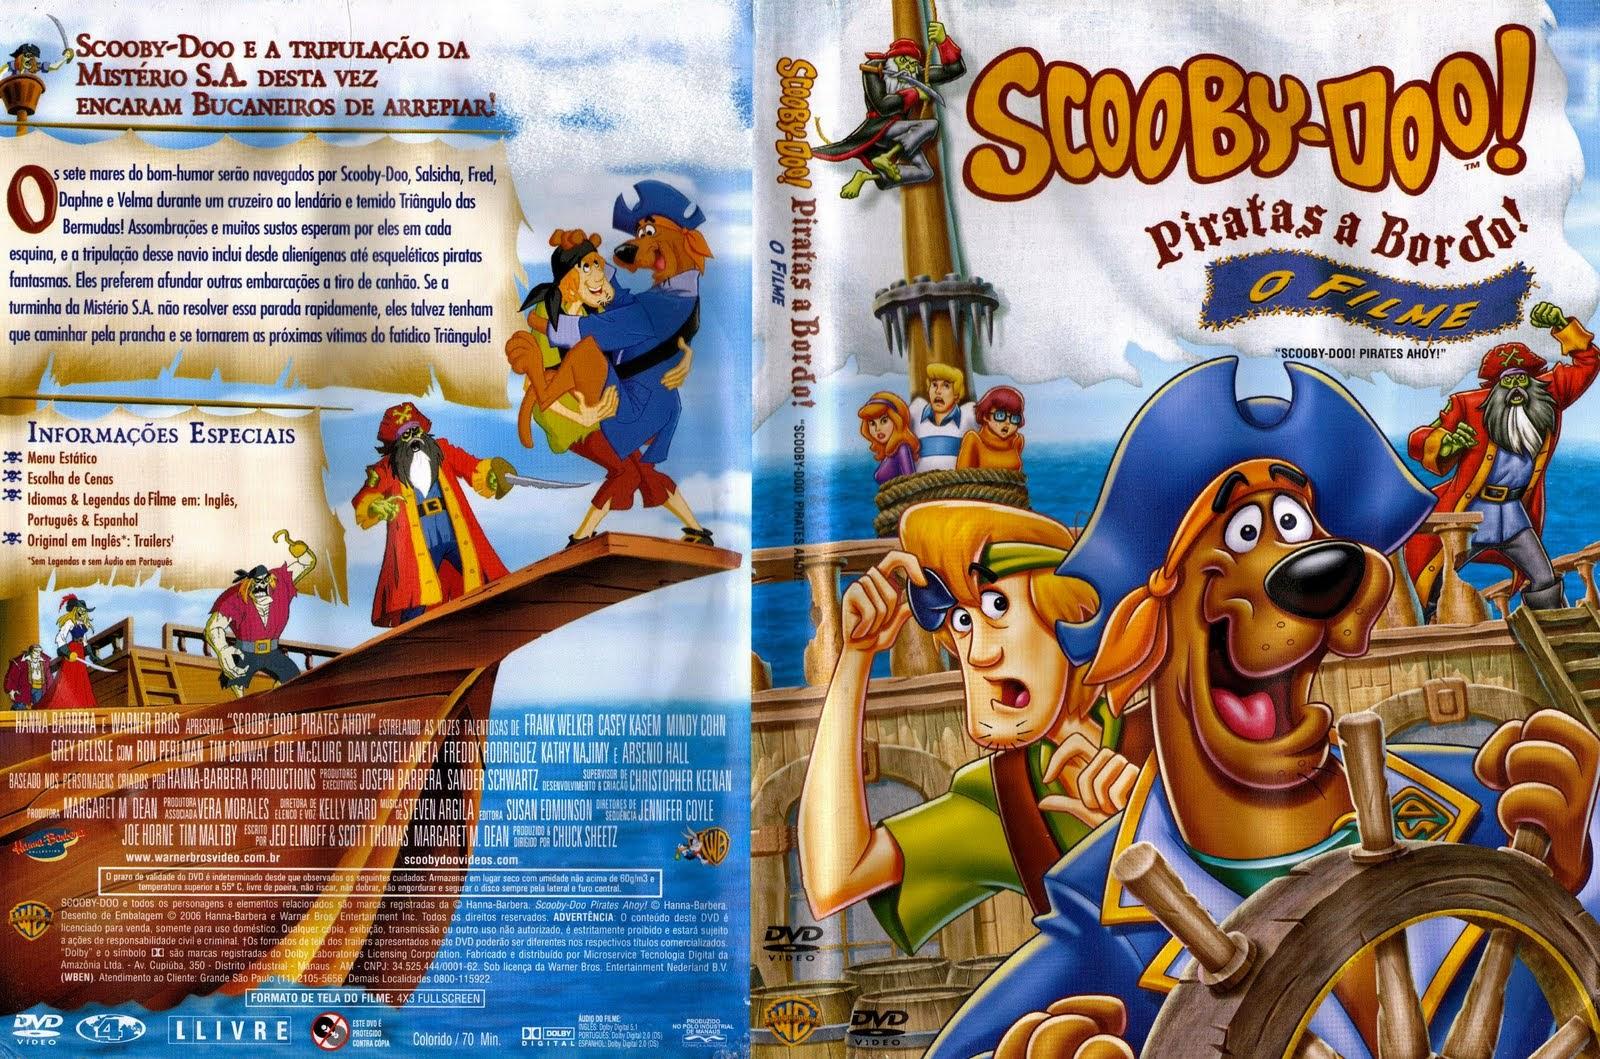 Scooby-Doo Piratas a Bordo